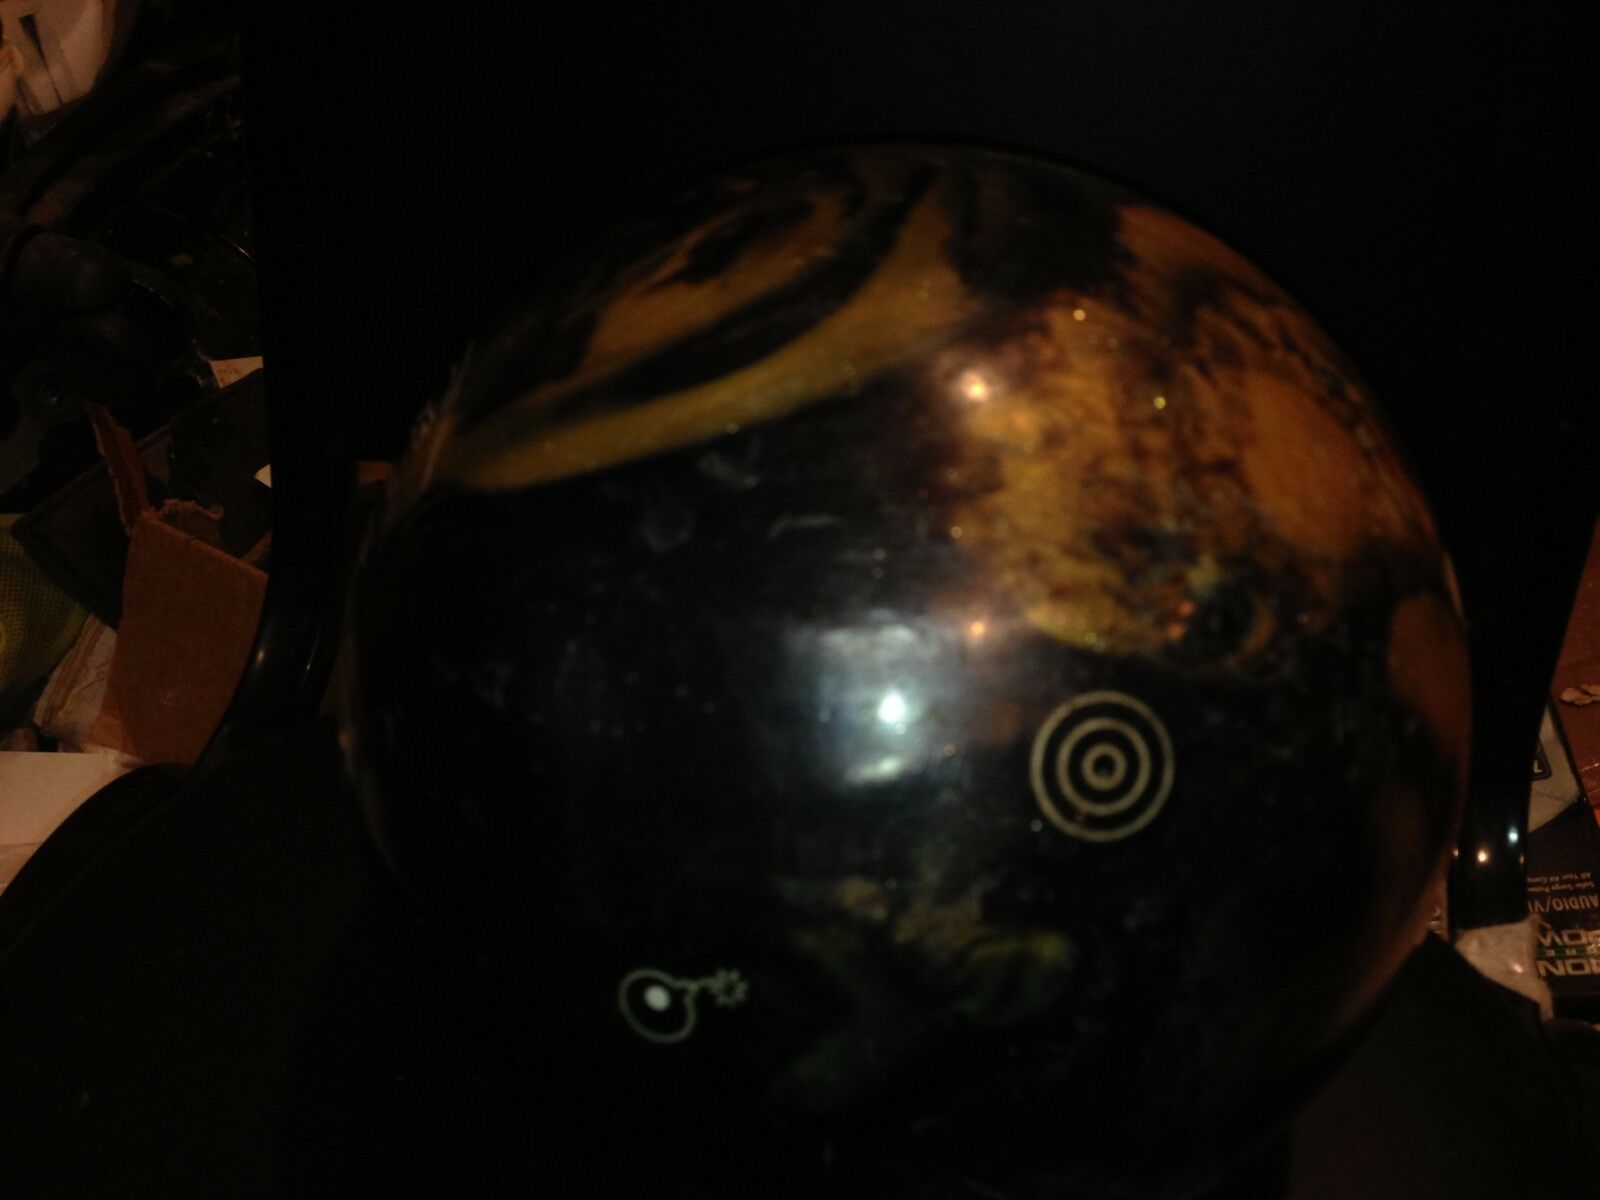 BOWLING BALL EBONITE 16LB MARTRIX DYNASTY NEW NO BOX